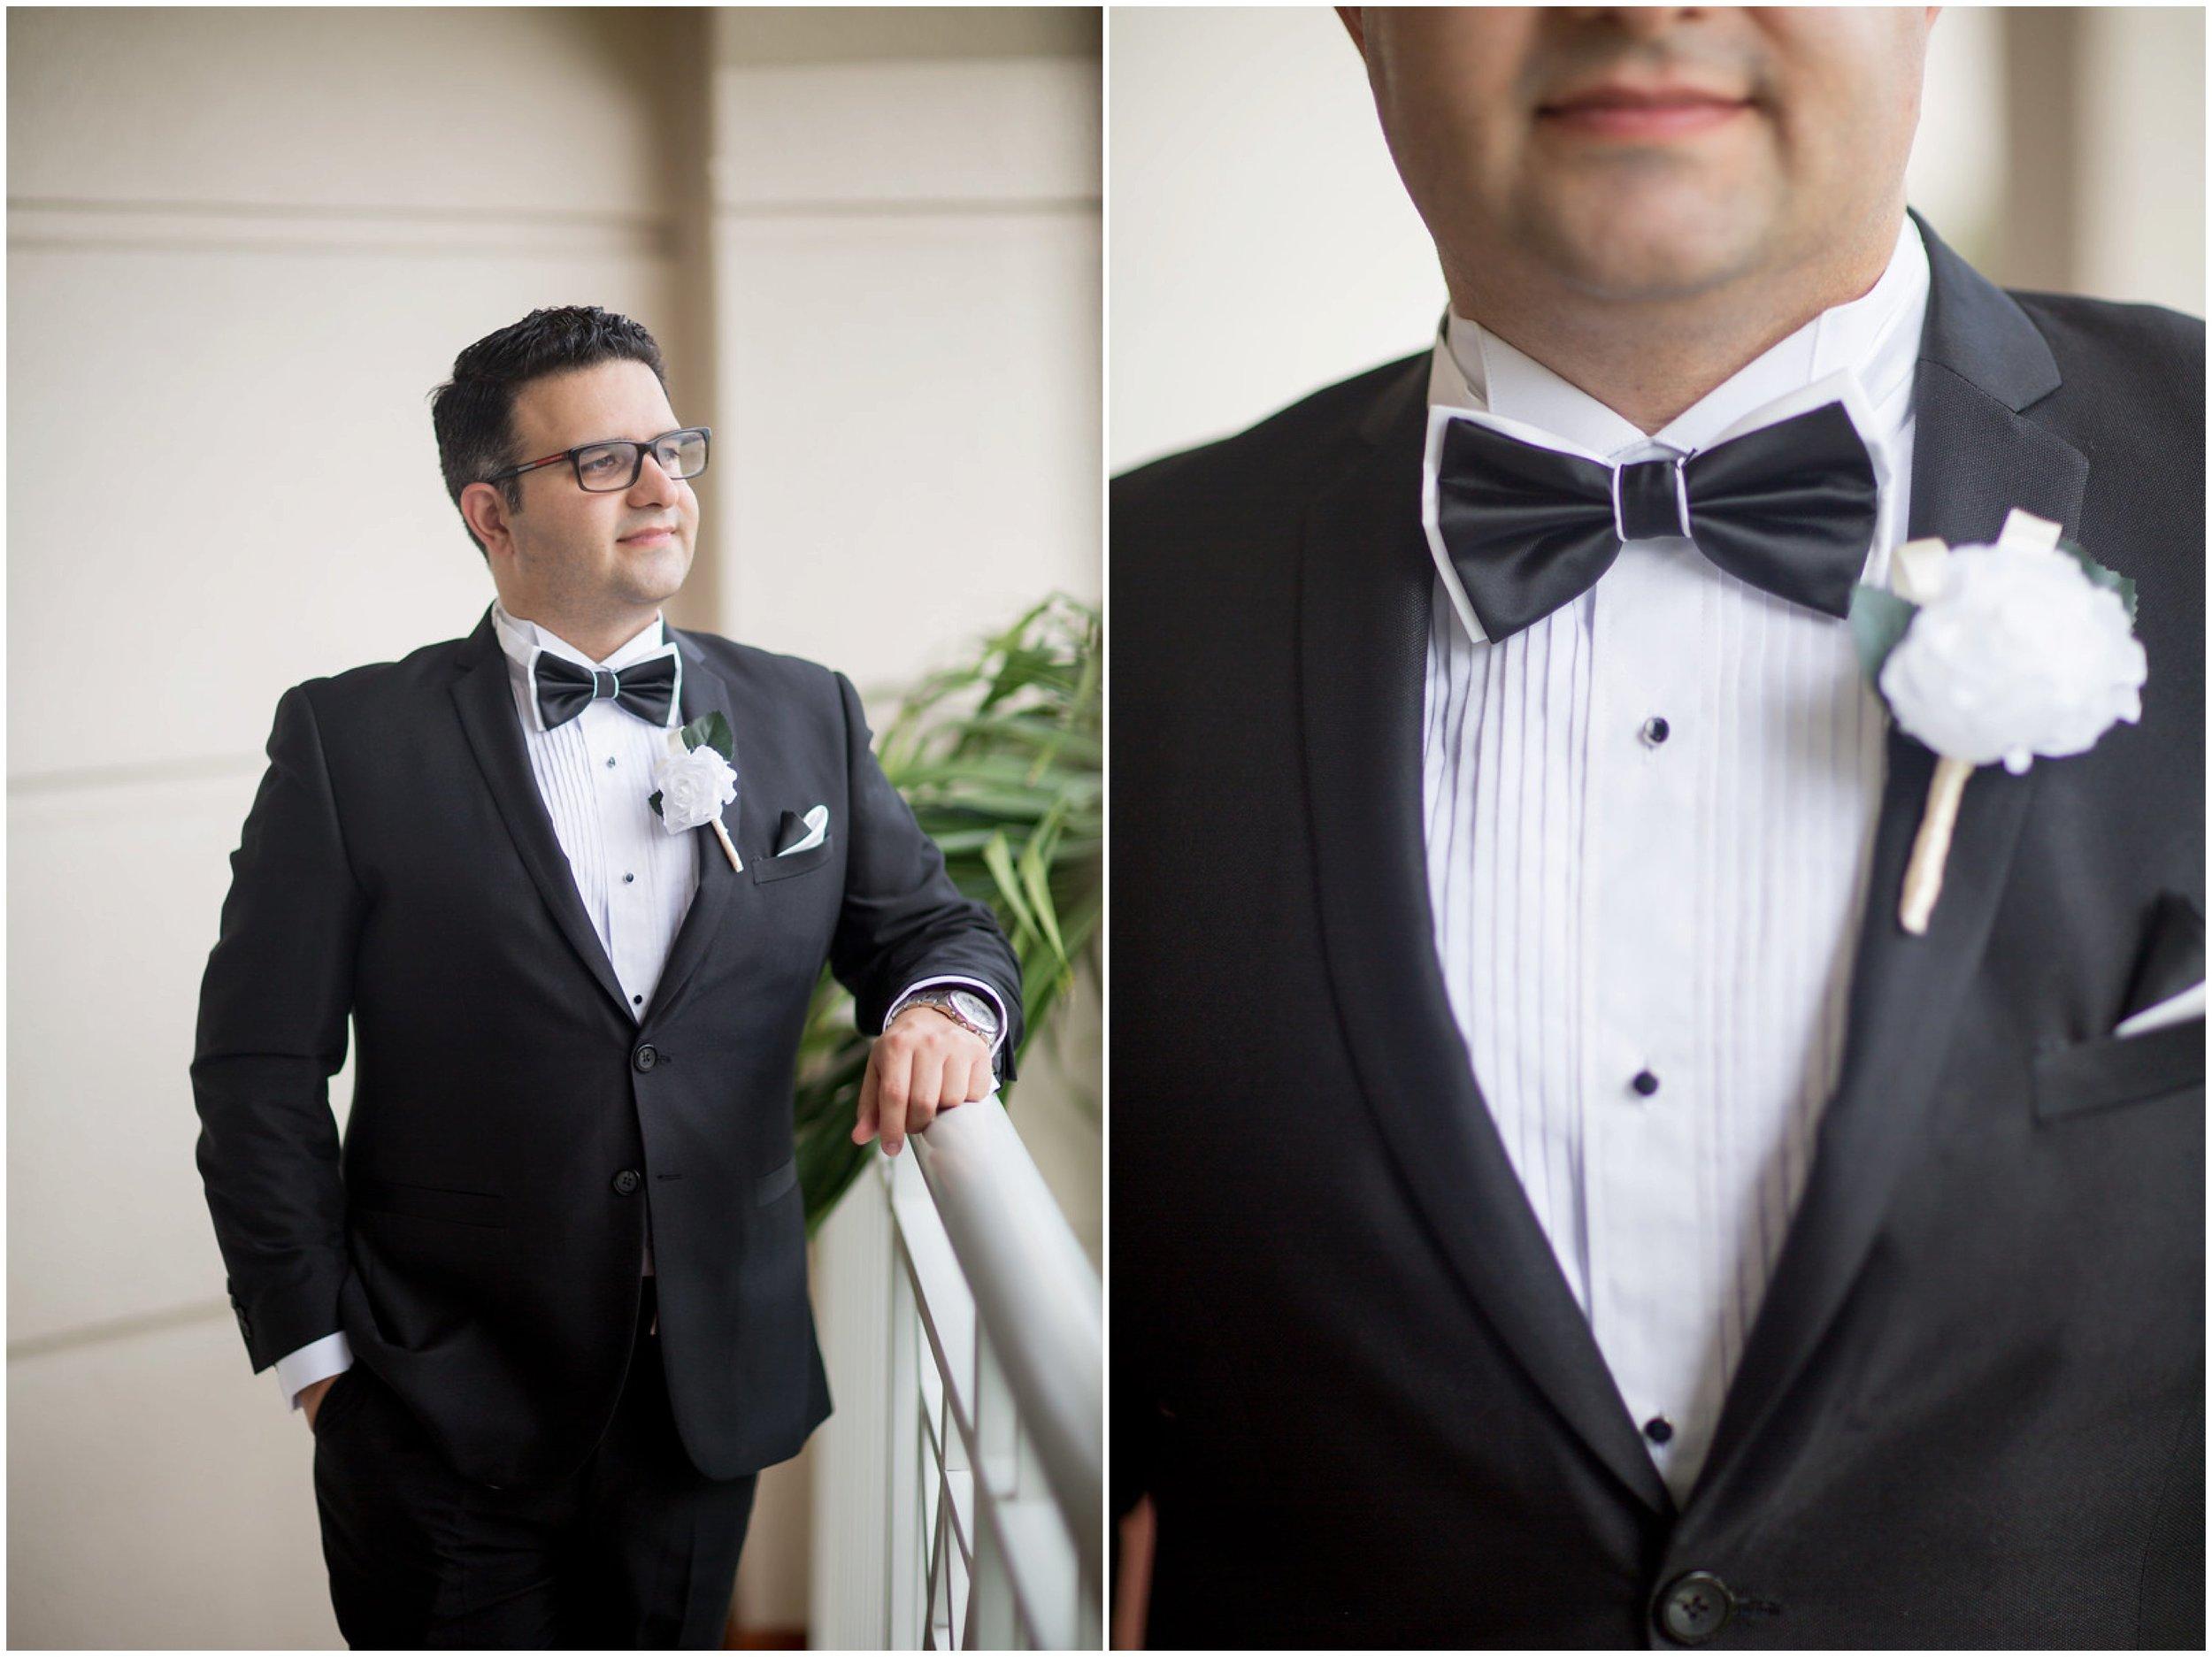 Le Cape Weddings- Destination Wedding Photography -ShayanandNikkie-126-X3_LuxuryDestinationPhotographer.jpg